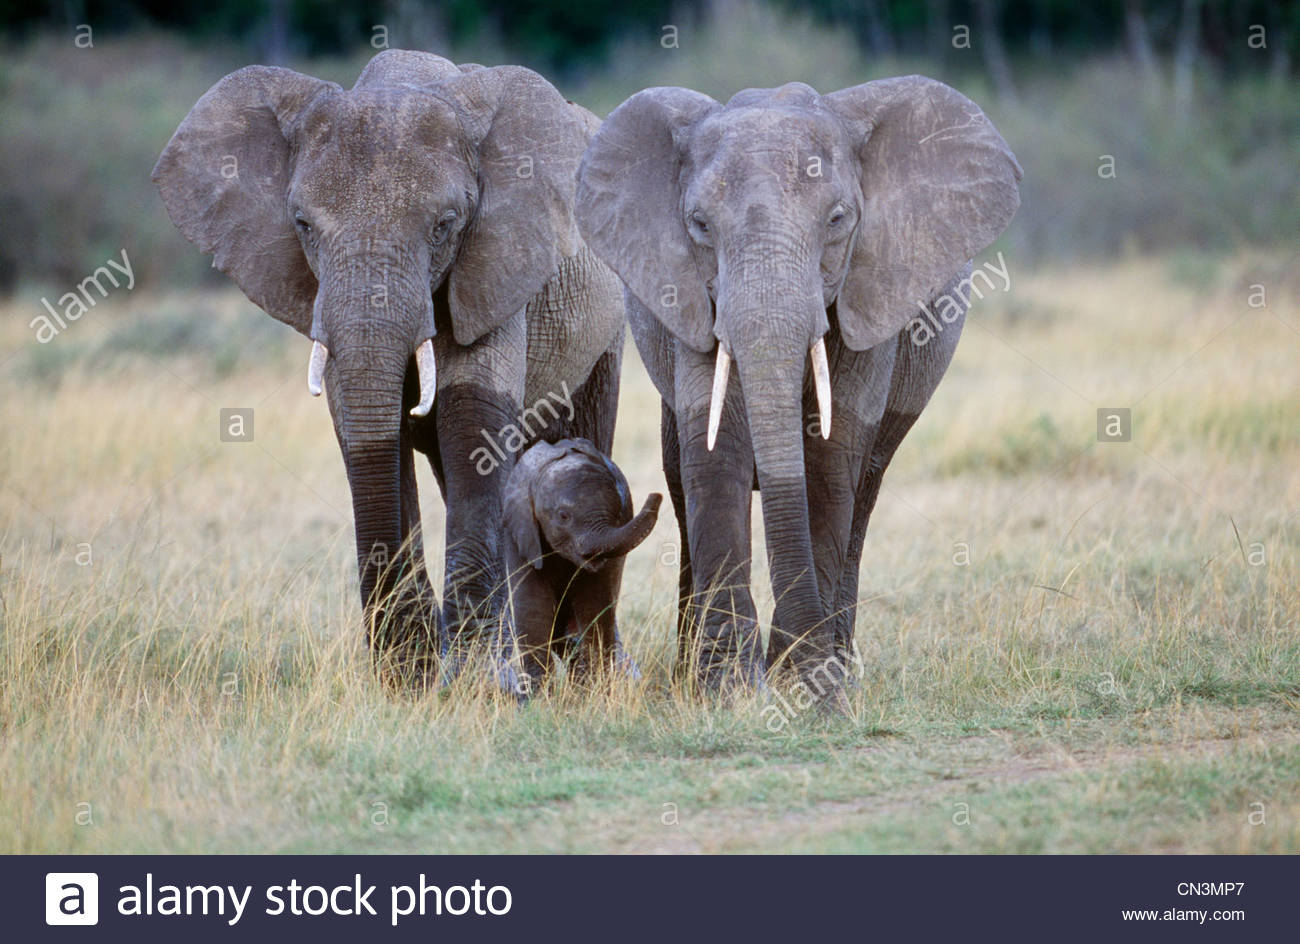 African elephants and calf, Amboseli National Park, Kenya - Stock Image